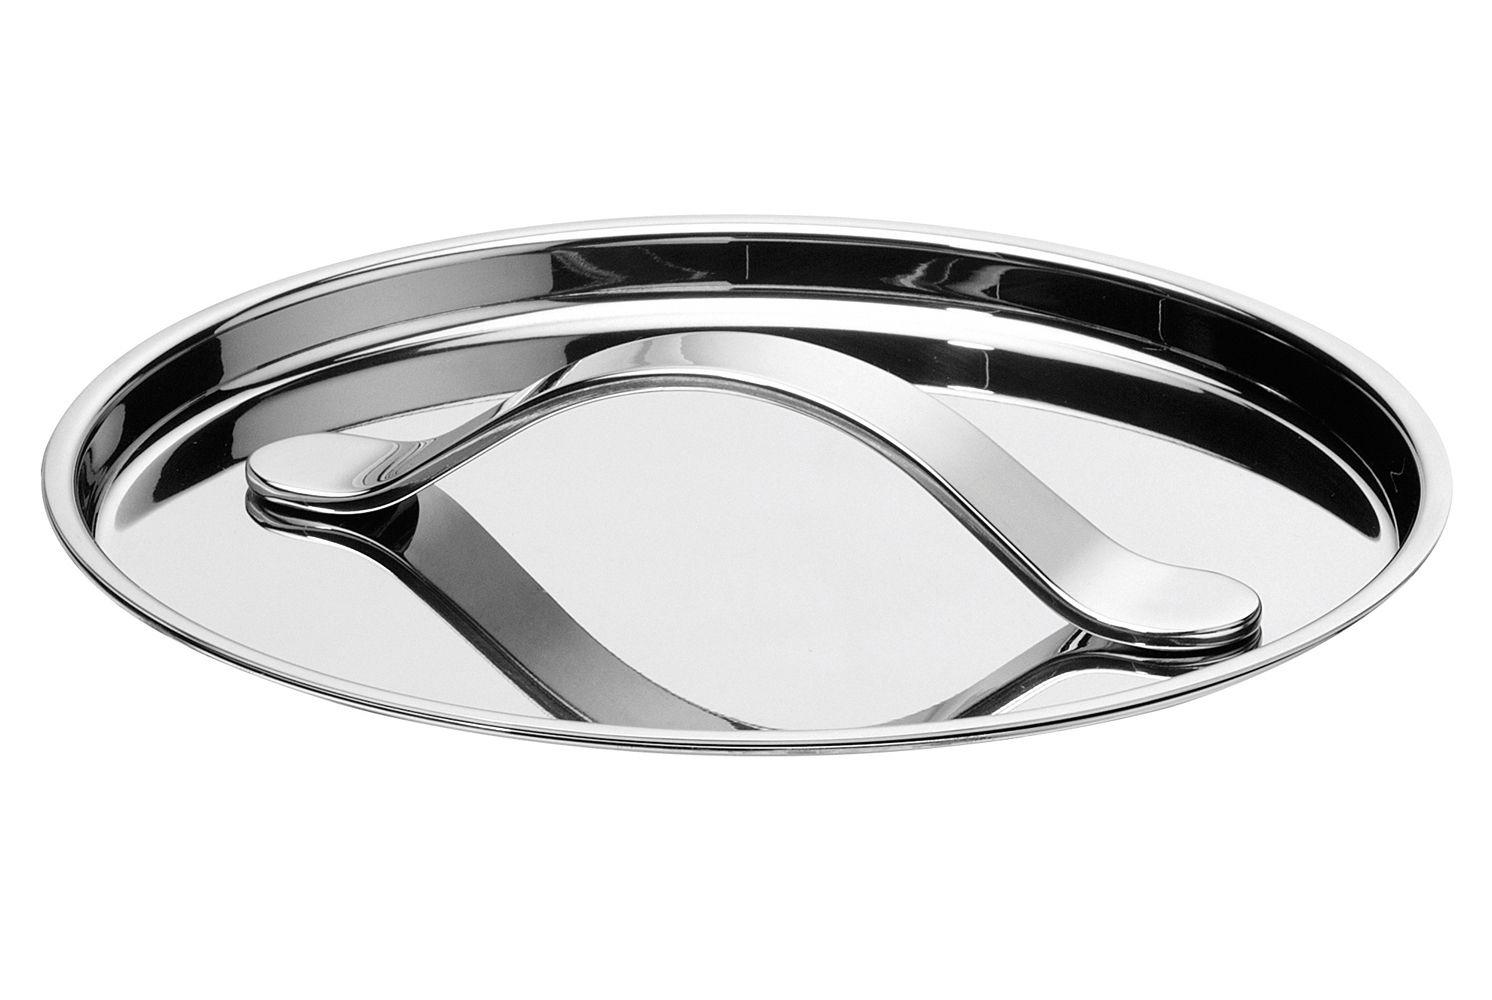 Kitchenware - Pots & Pans - Al Dente Lid - Ø 24 cm by Serafino Zani - Ø 24 cm - Shiny stainless steel - Polished stainless steel